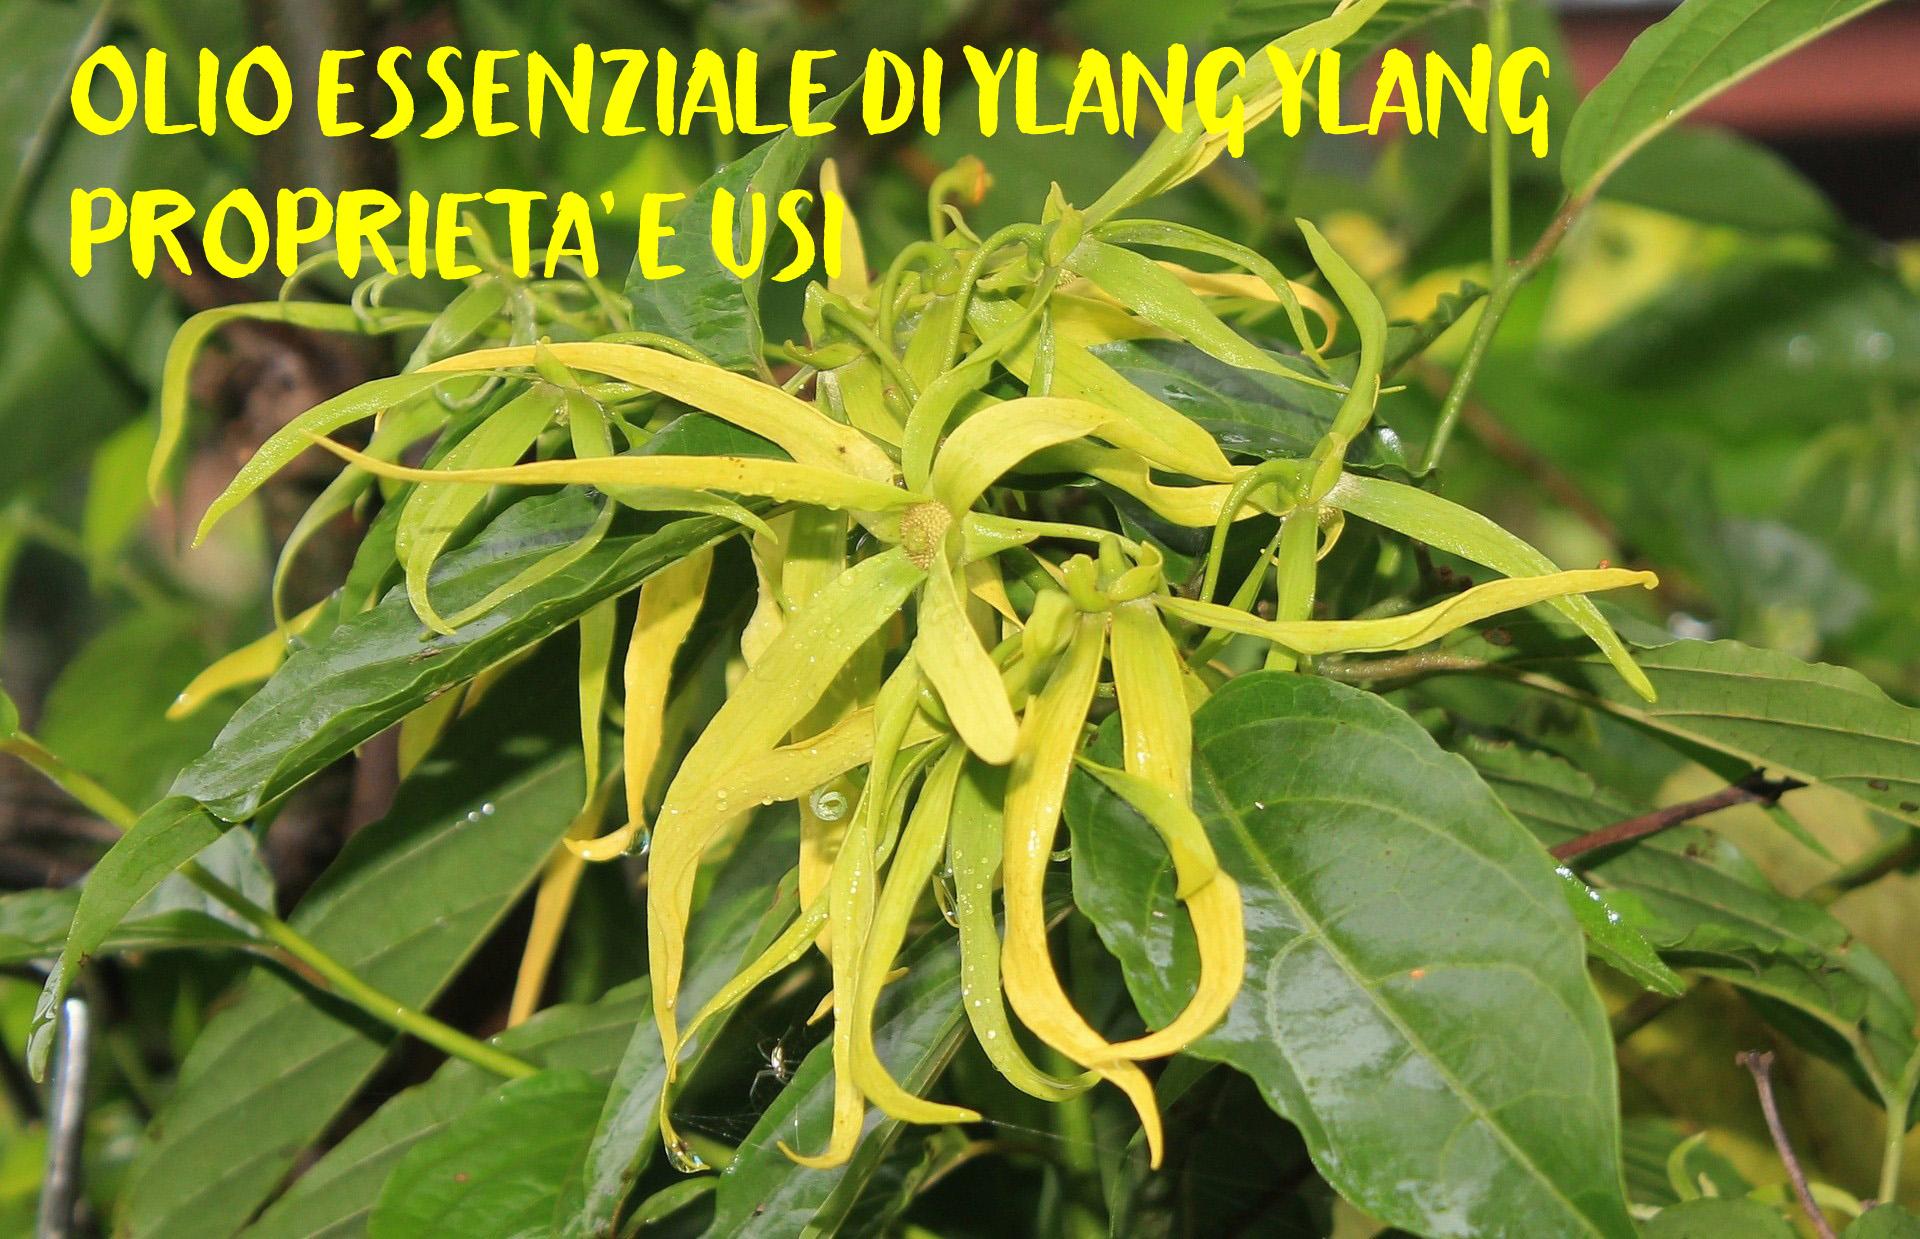 Olio essenziale di ylang ylang: proprietà e usi